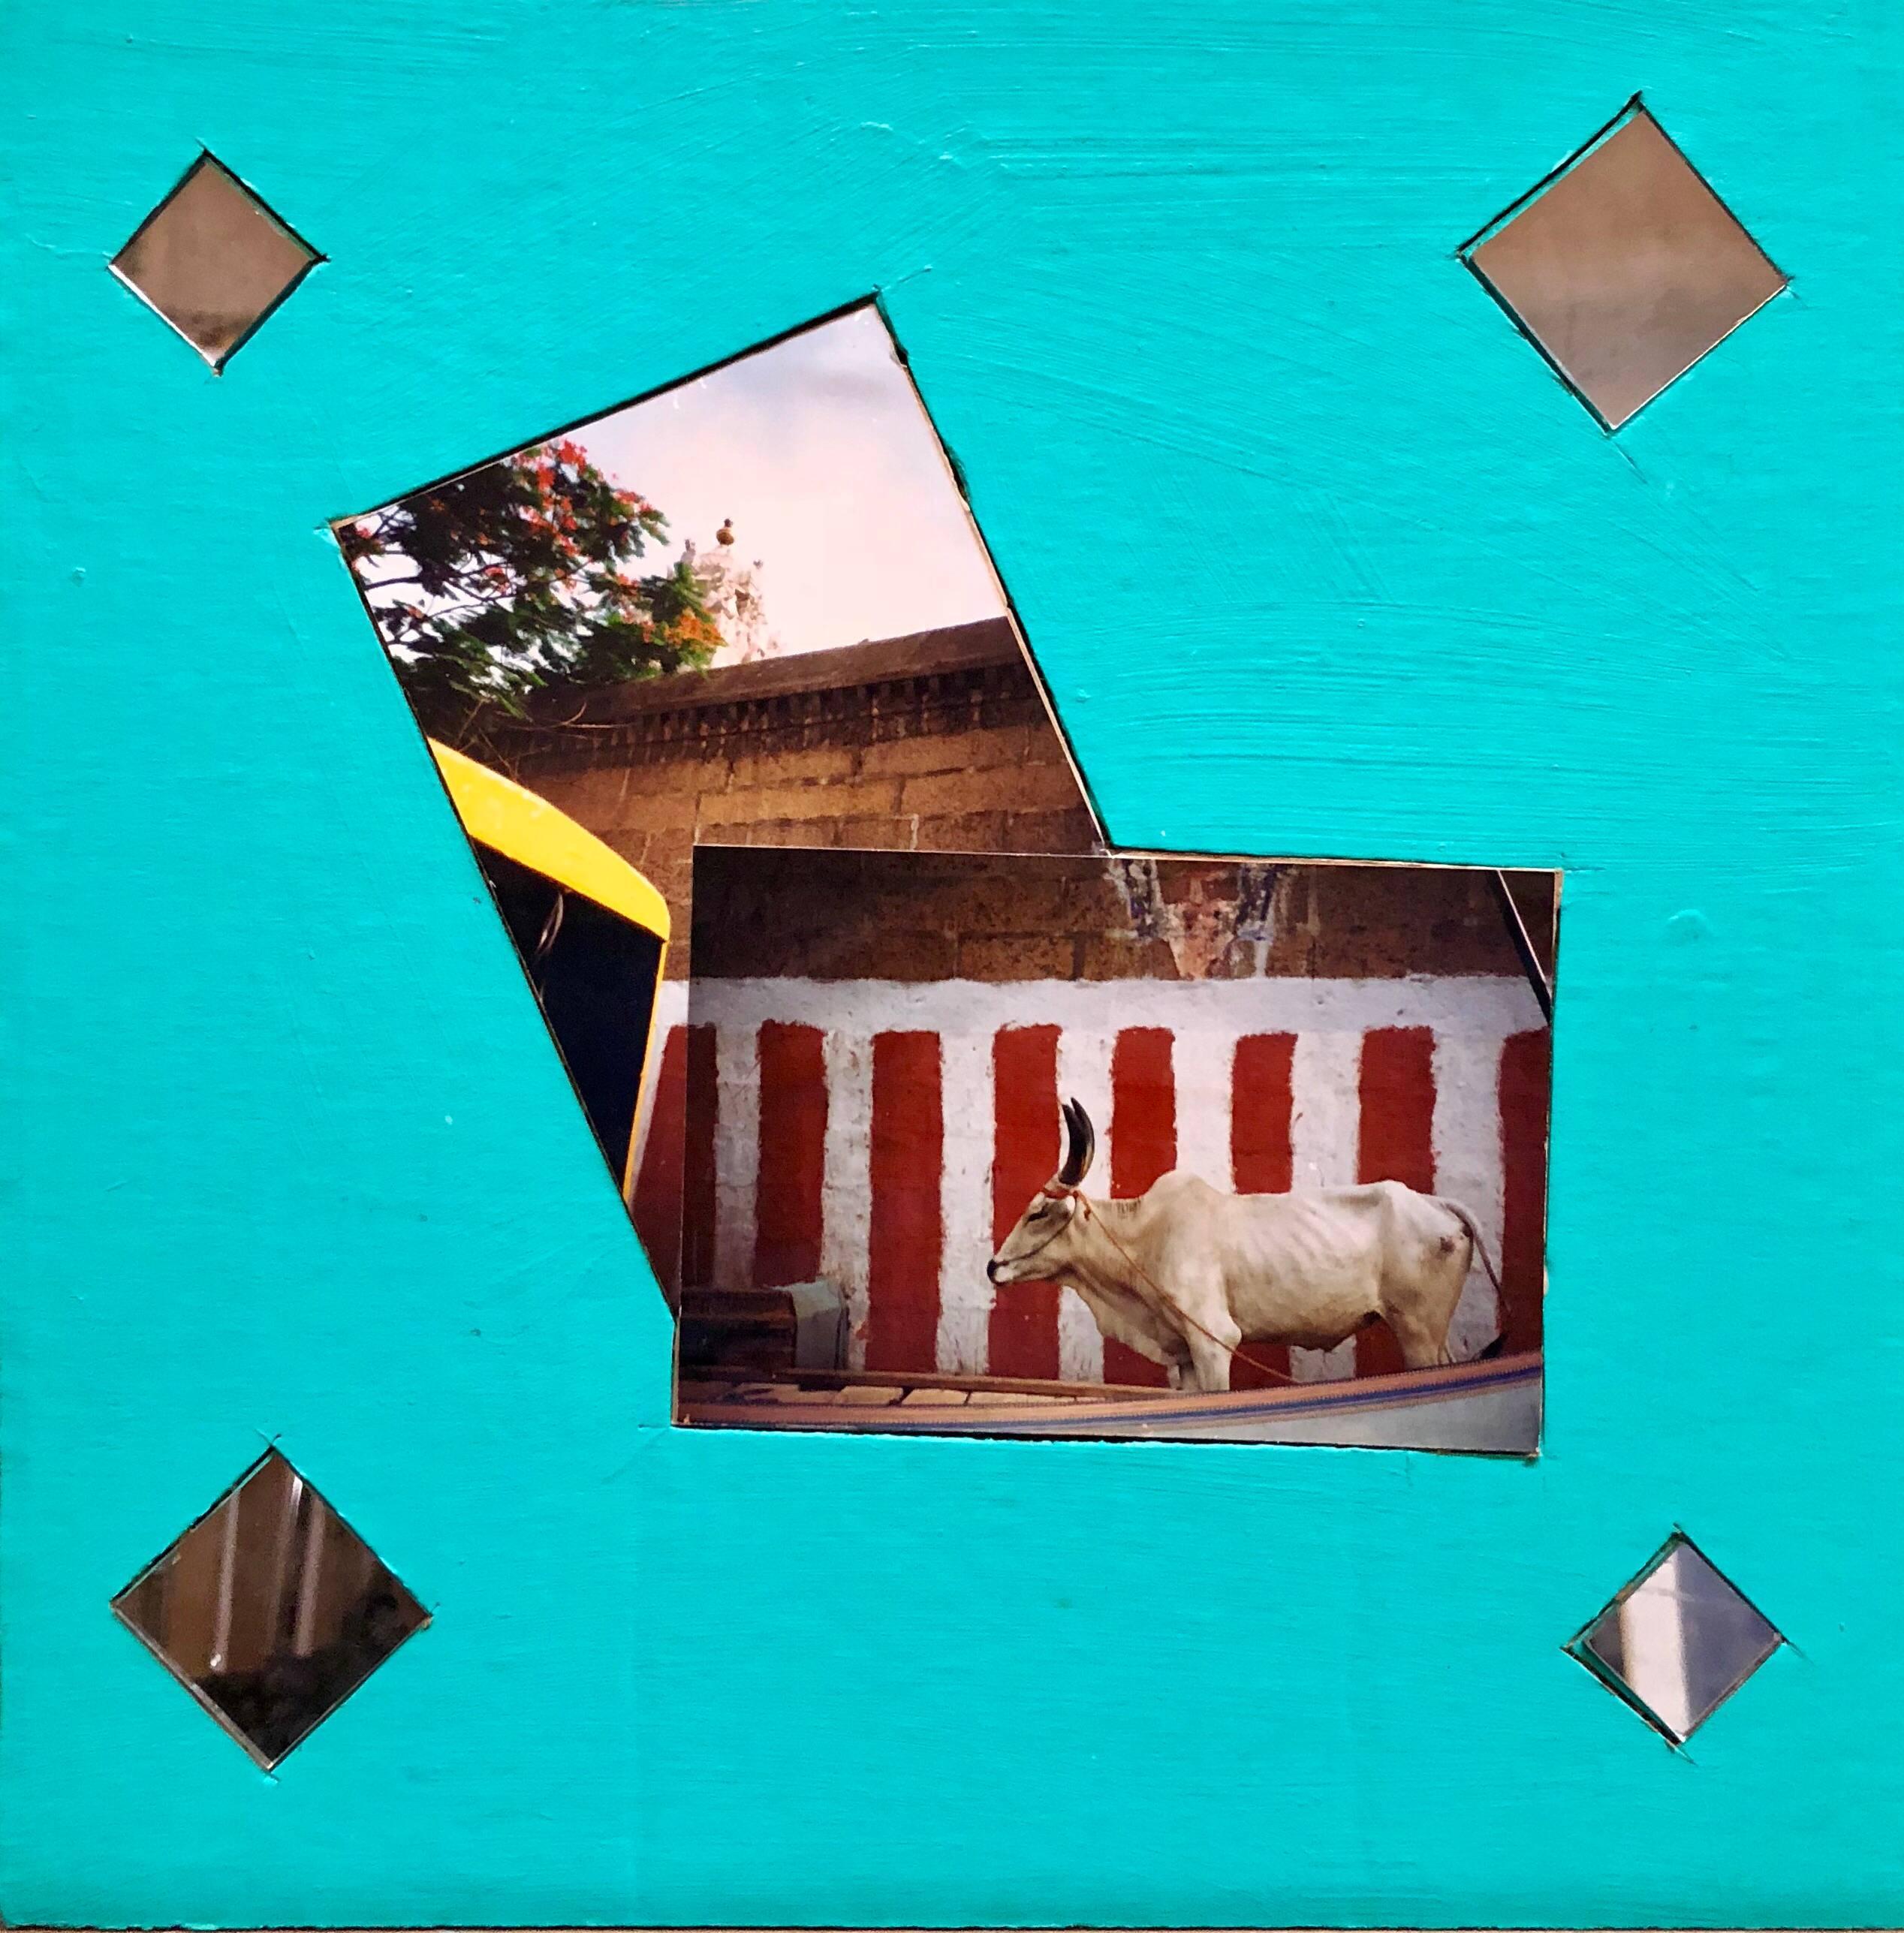 Chindambaram Temple, Mixed Media Photo Collage on Cardboard